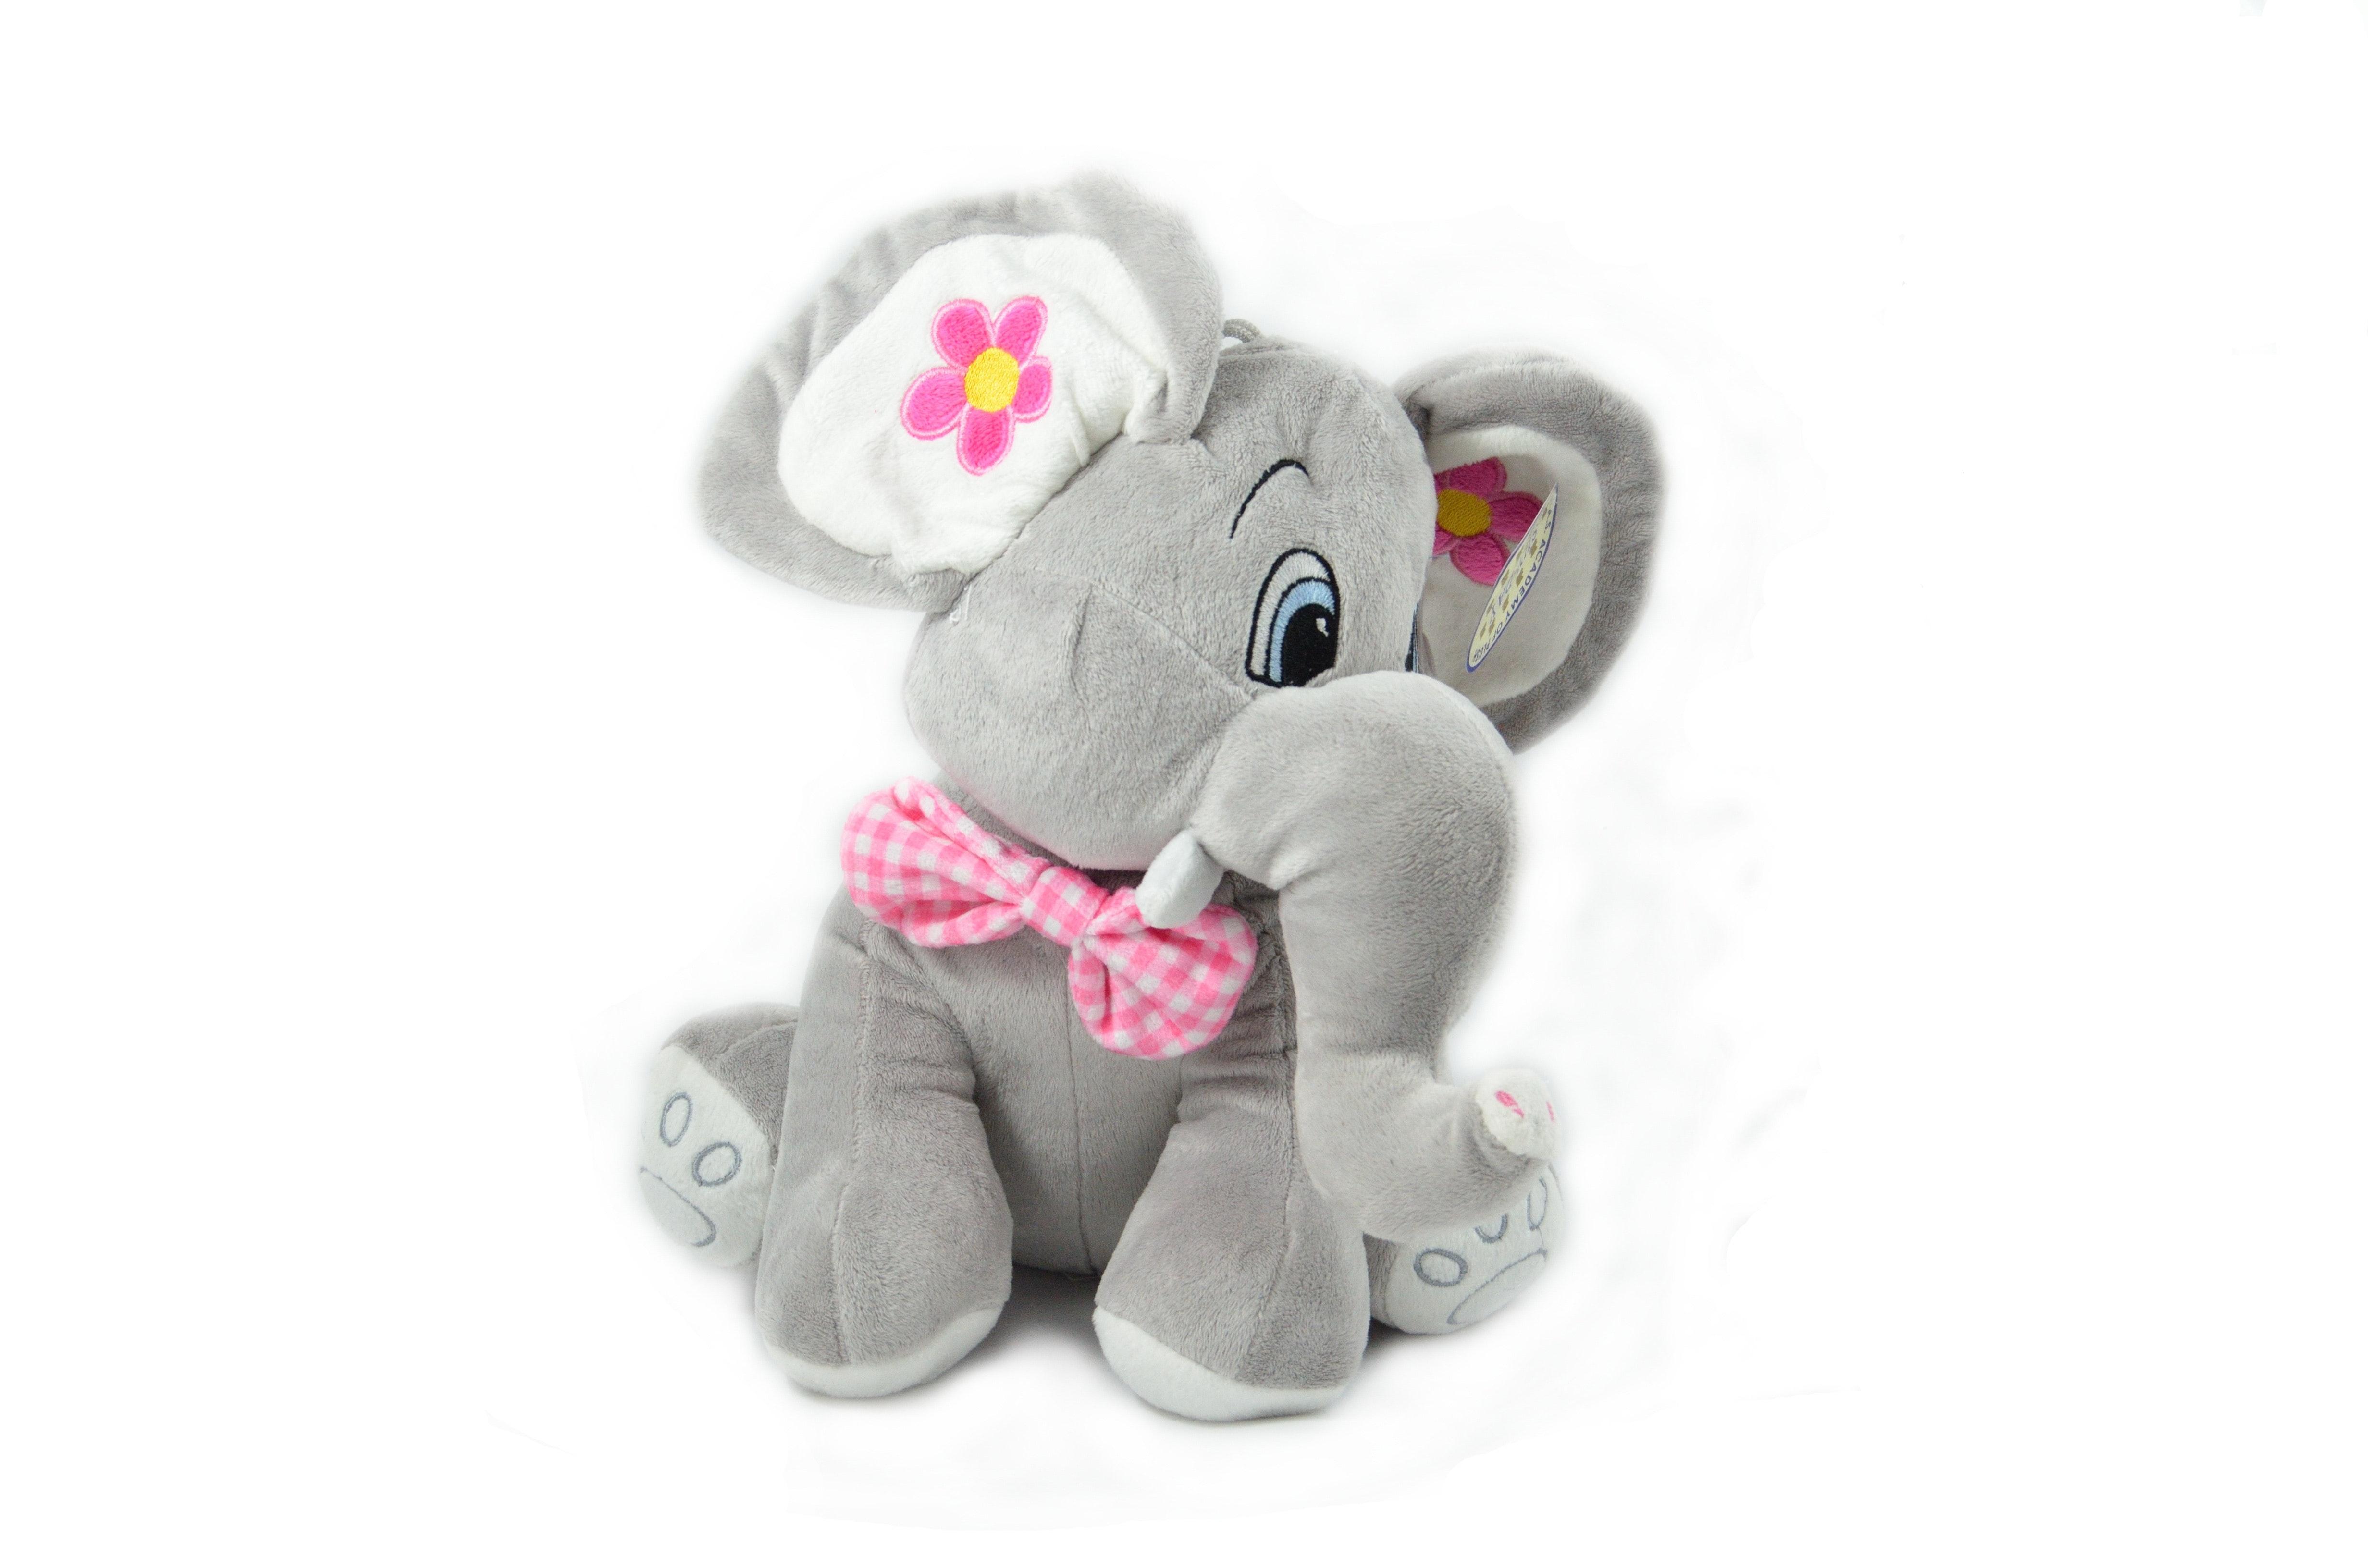 Gray Elephant Plush Toy Free Stock Photo